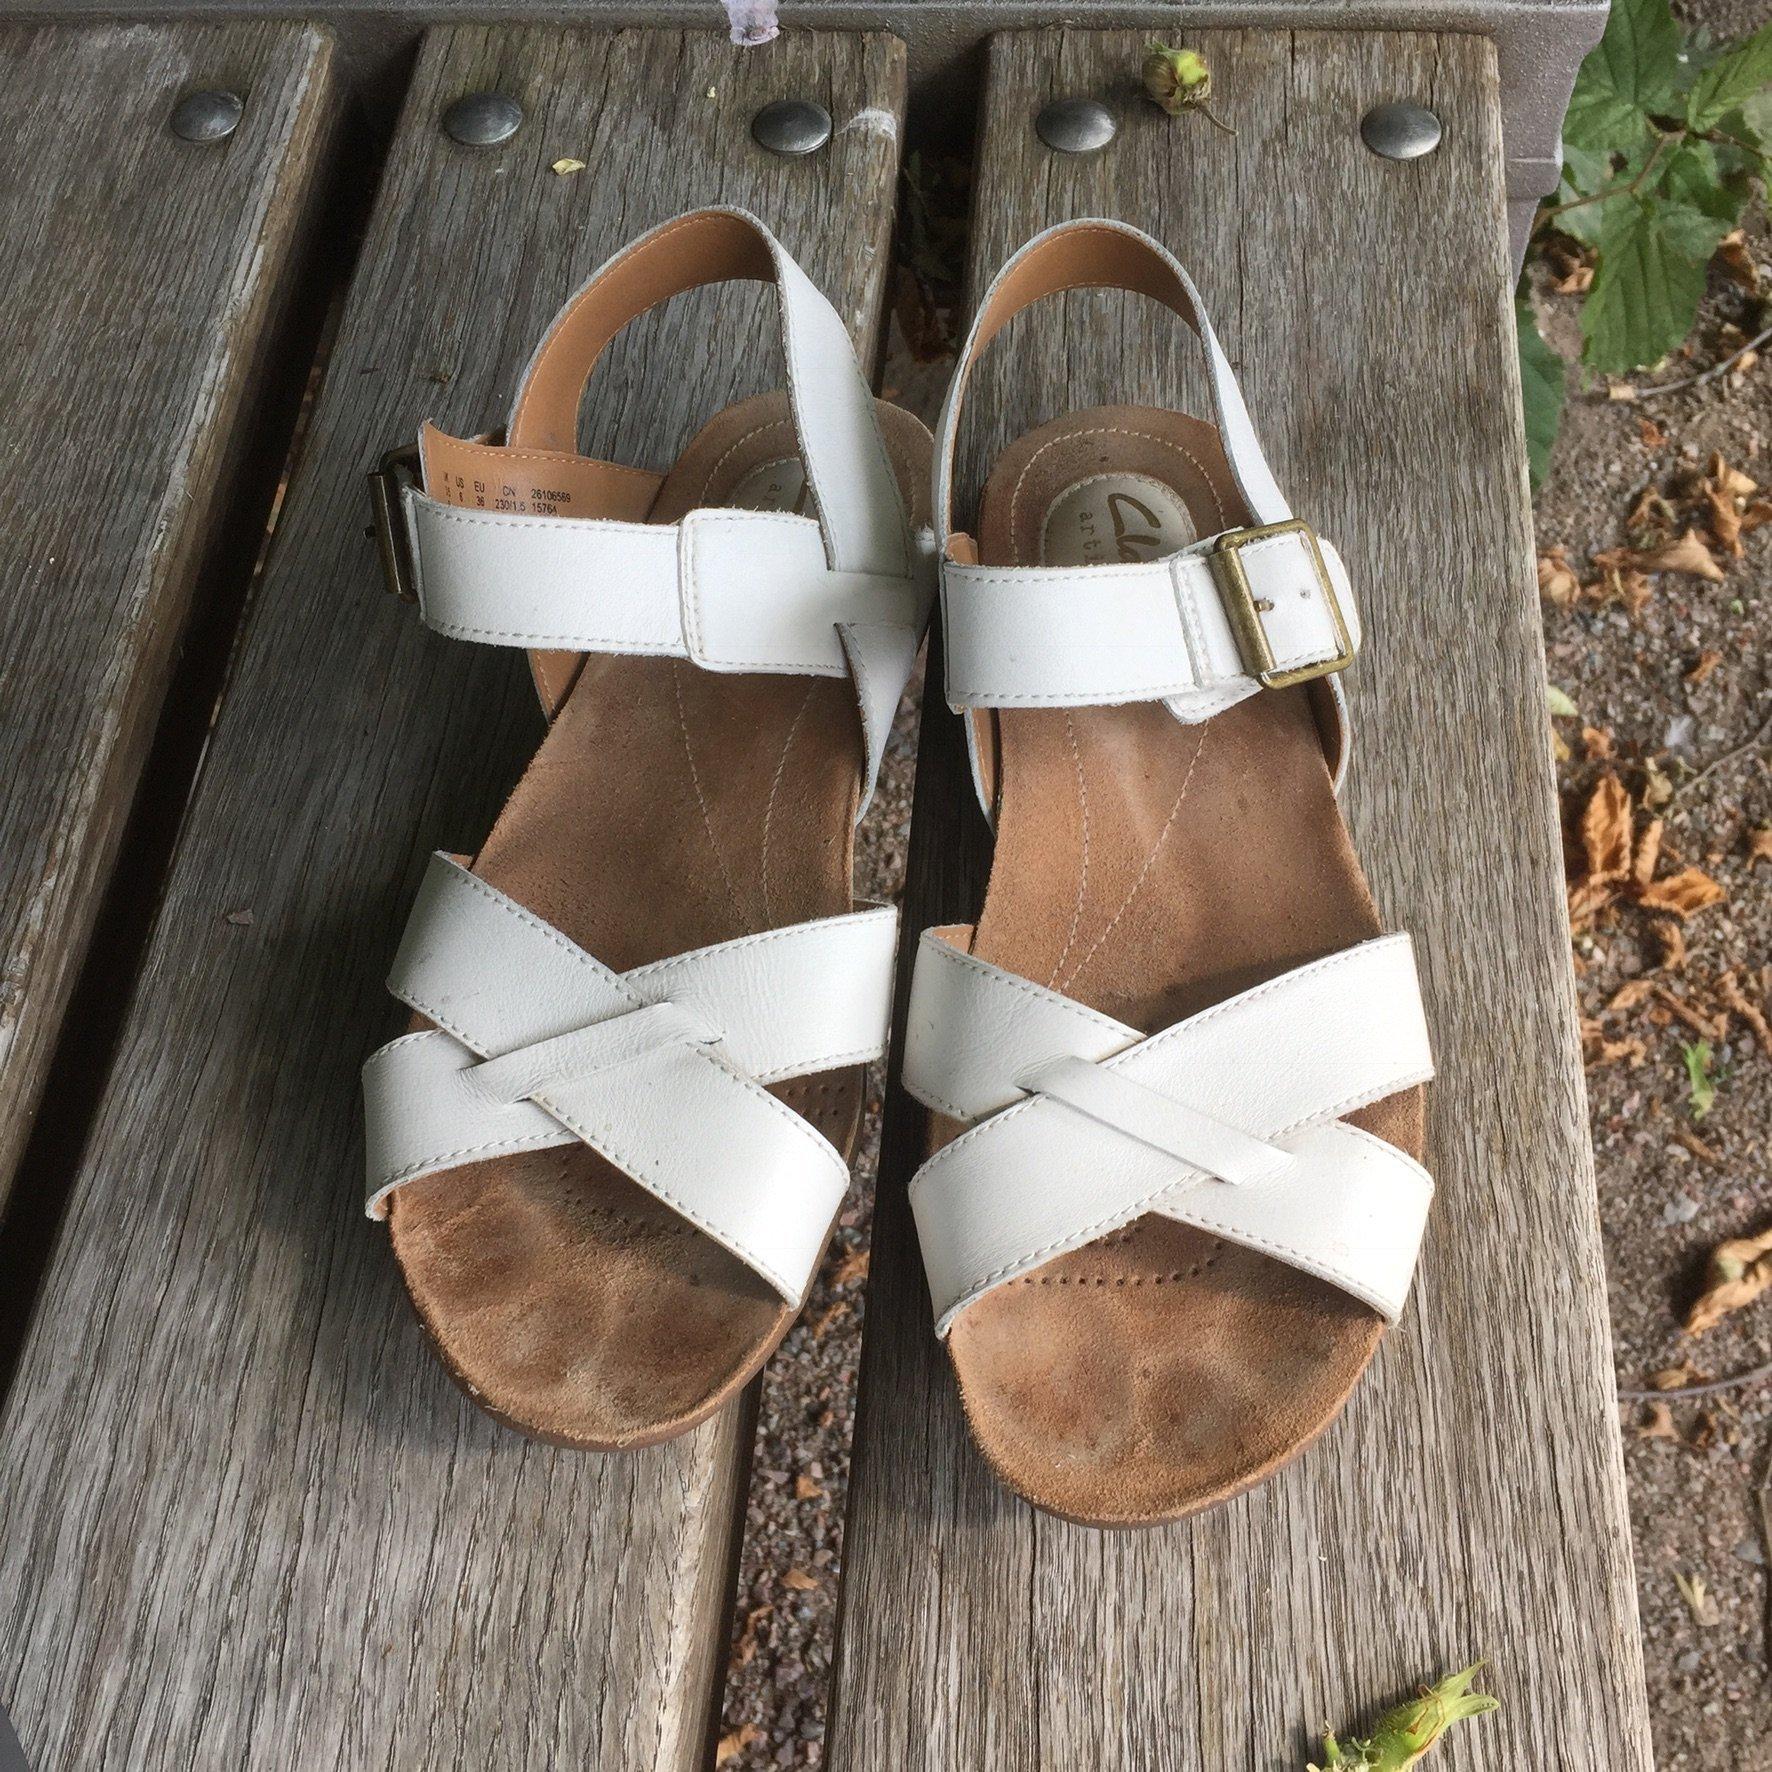 reducerat pris toppmode beställa clarks vita sandaler